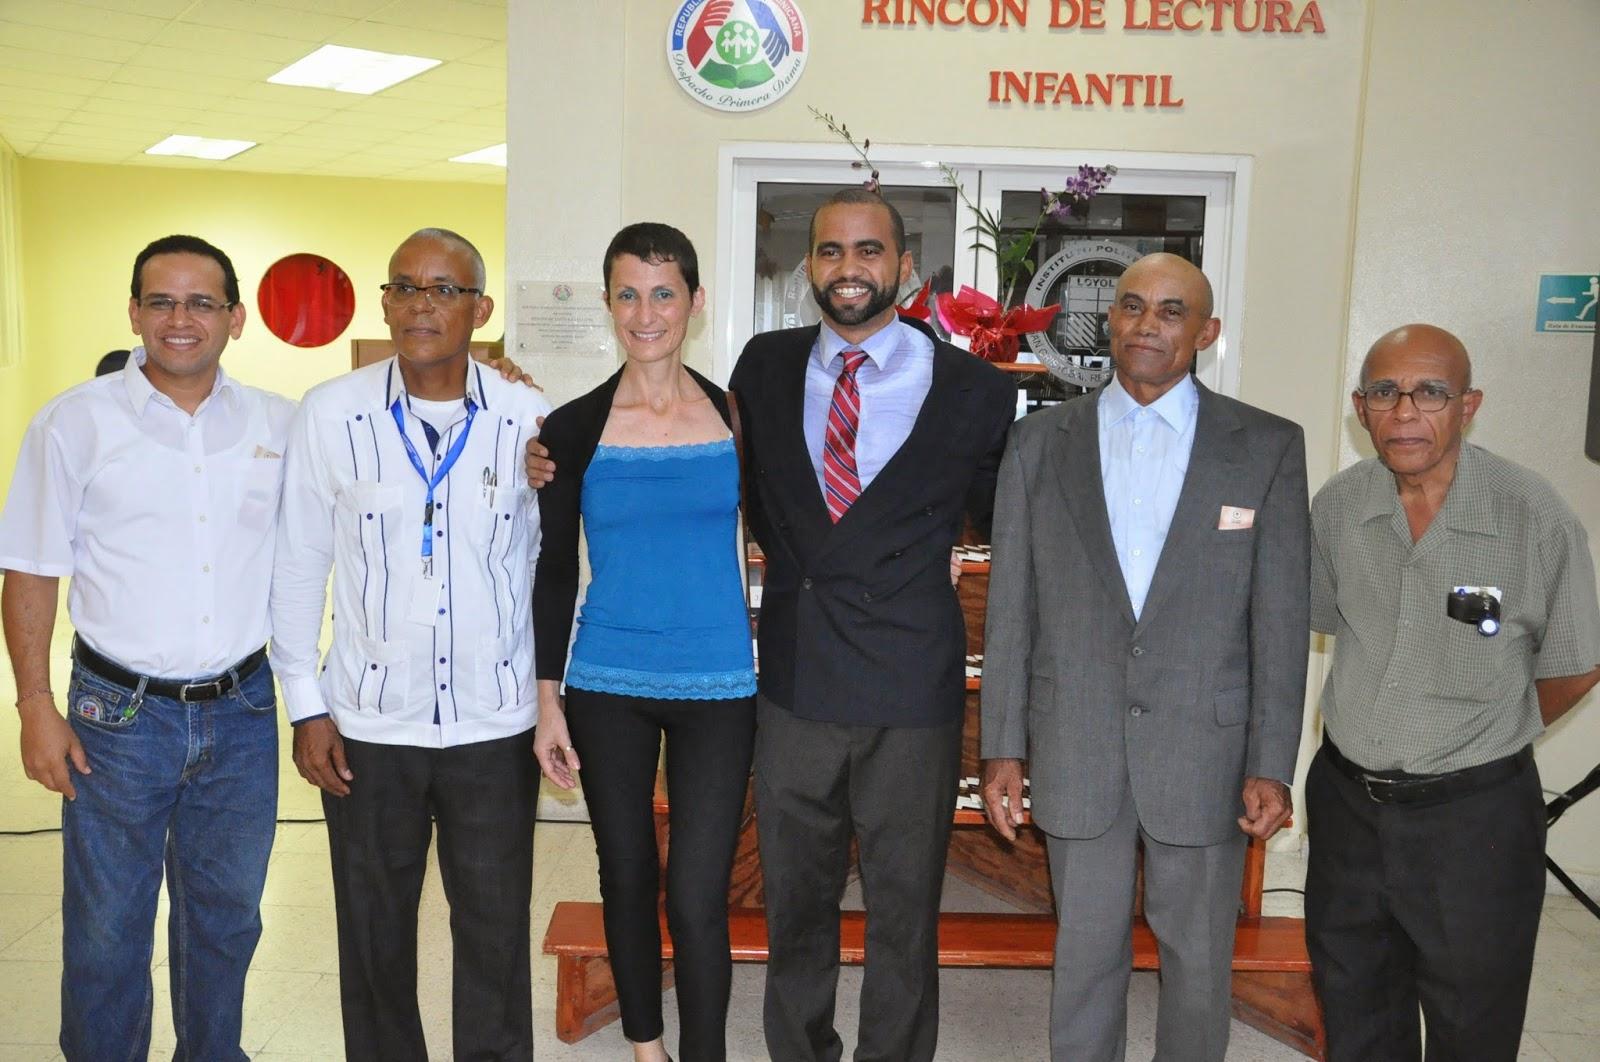 Ambiorix Polanco, Eugenio Galán, Michela Izzo, Cristino Alberto Gómez, Luis Ceferino Gómez y Rafael Amarabis Suero